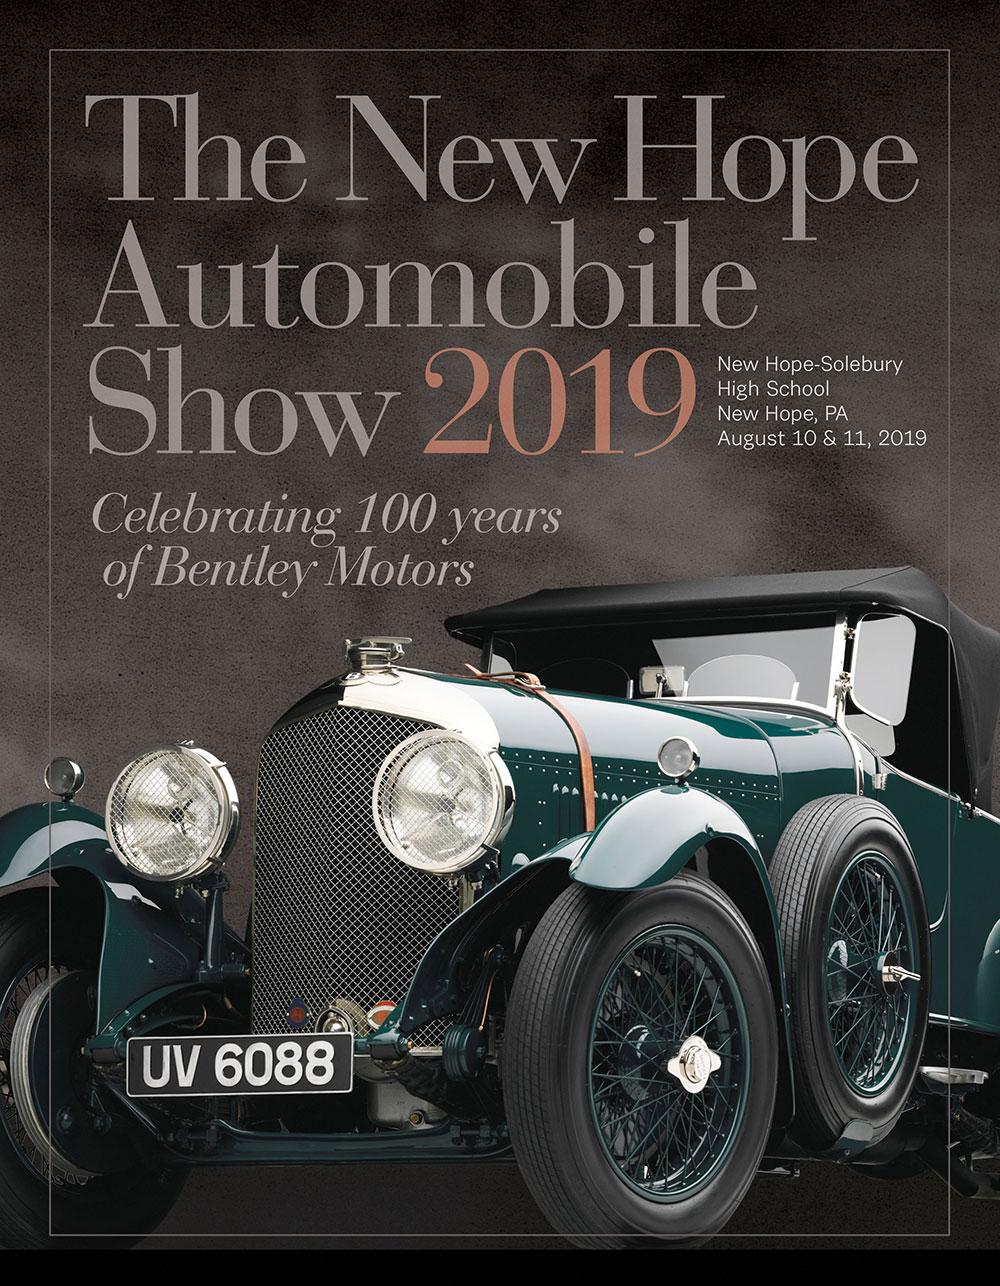 The New Hope Automobile Show 2019 Program book cover